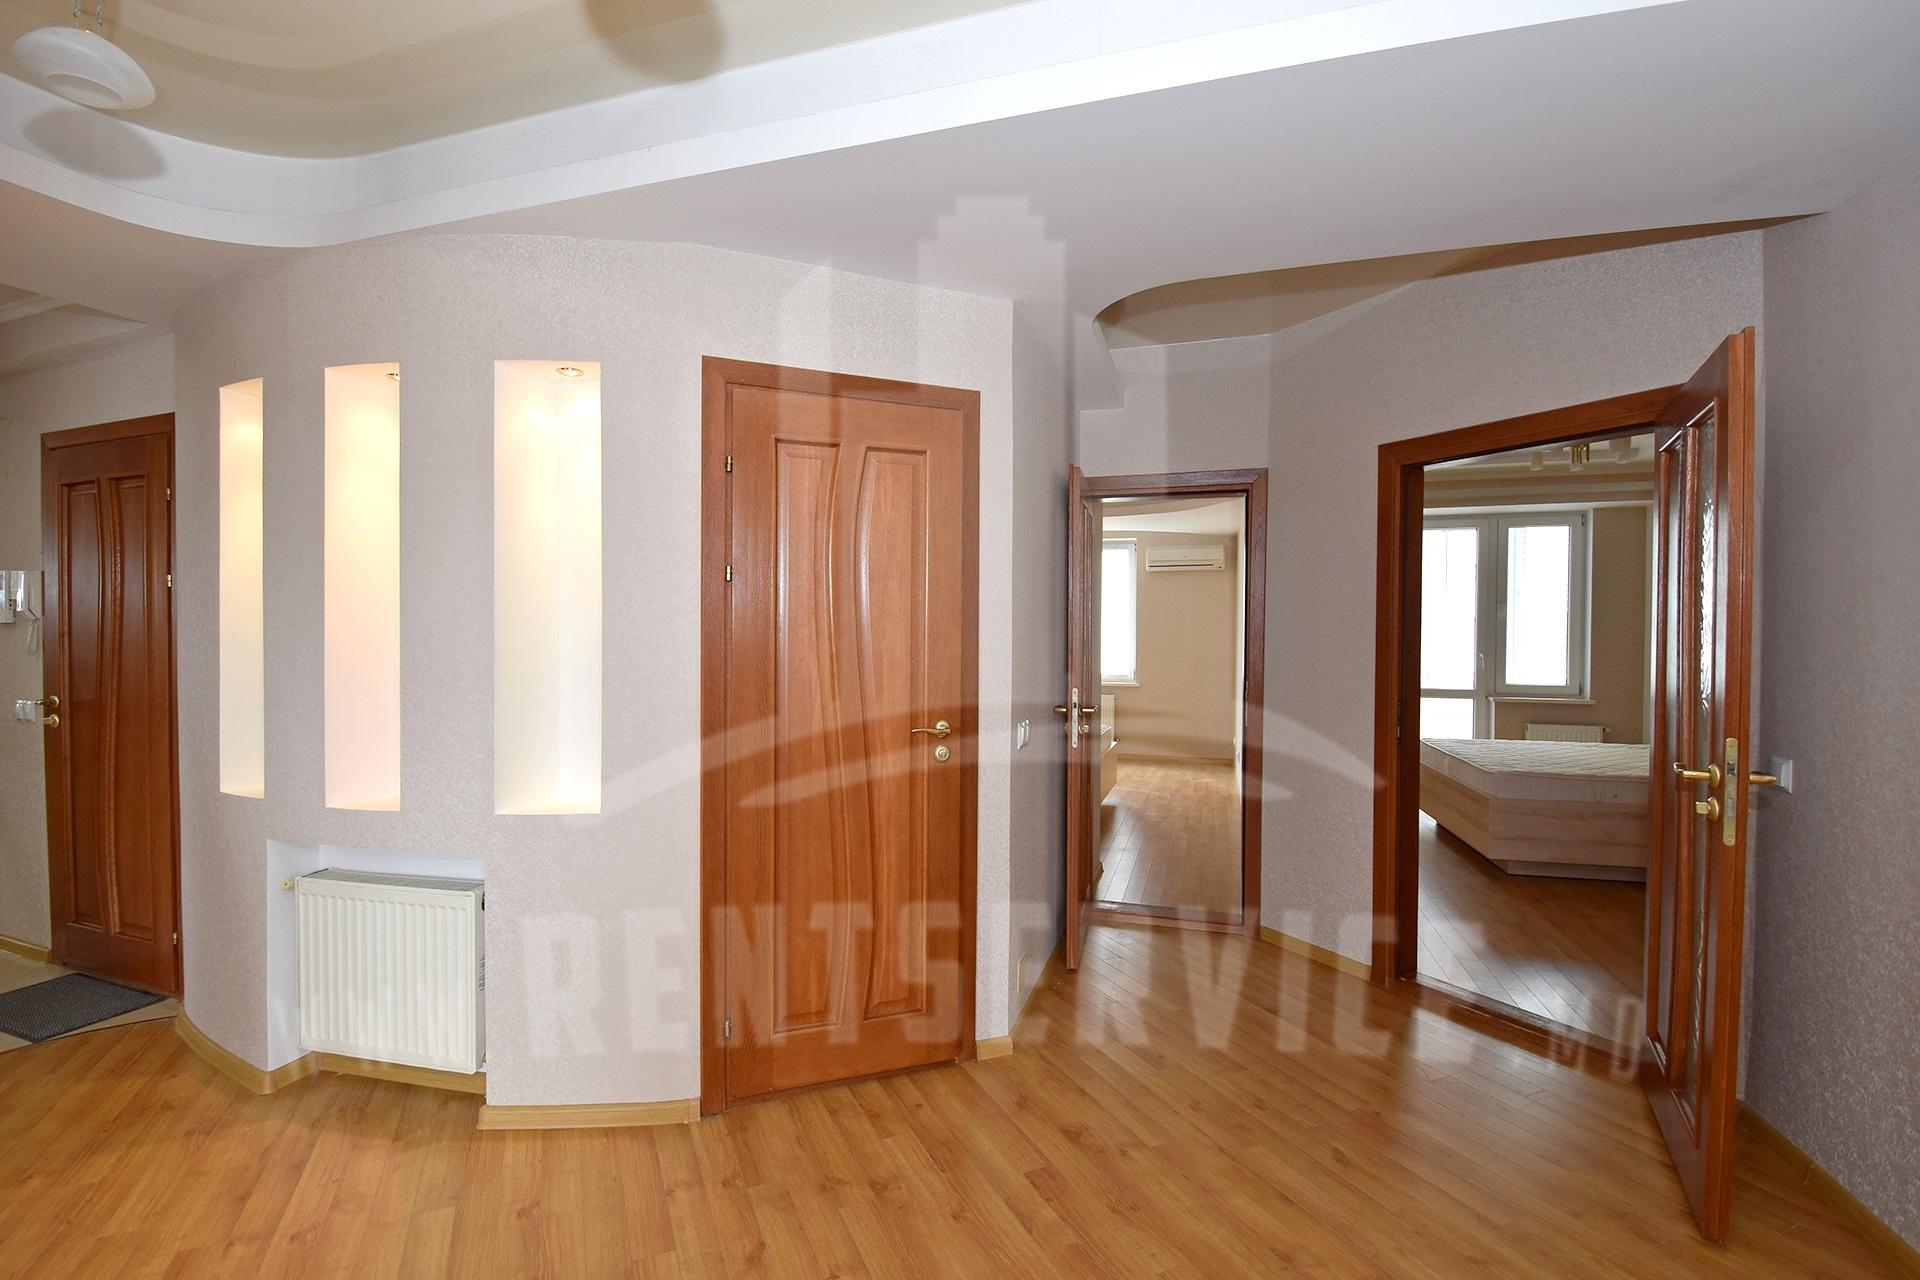 211_apartment_3.JPG